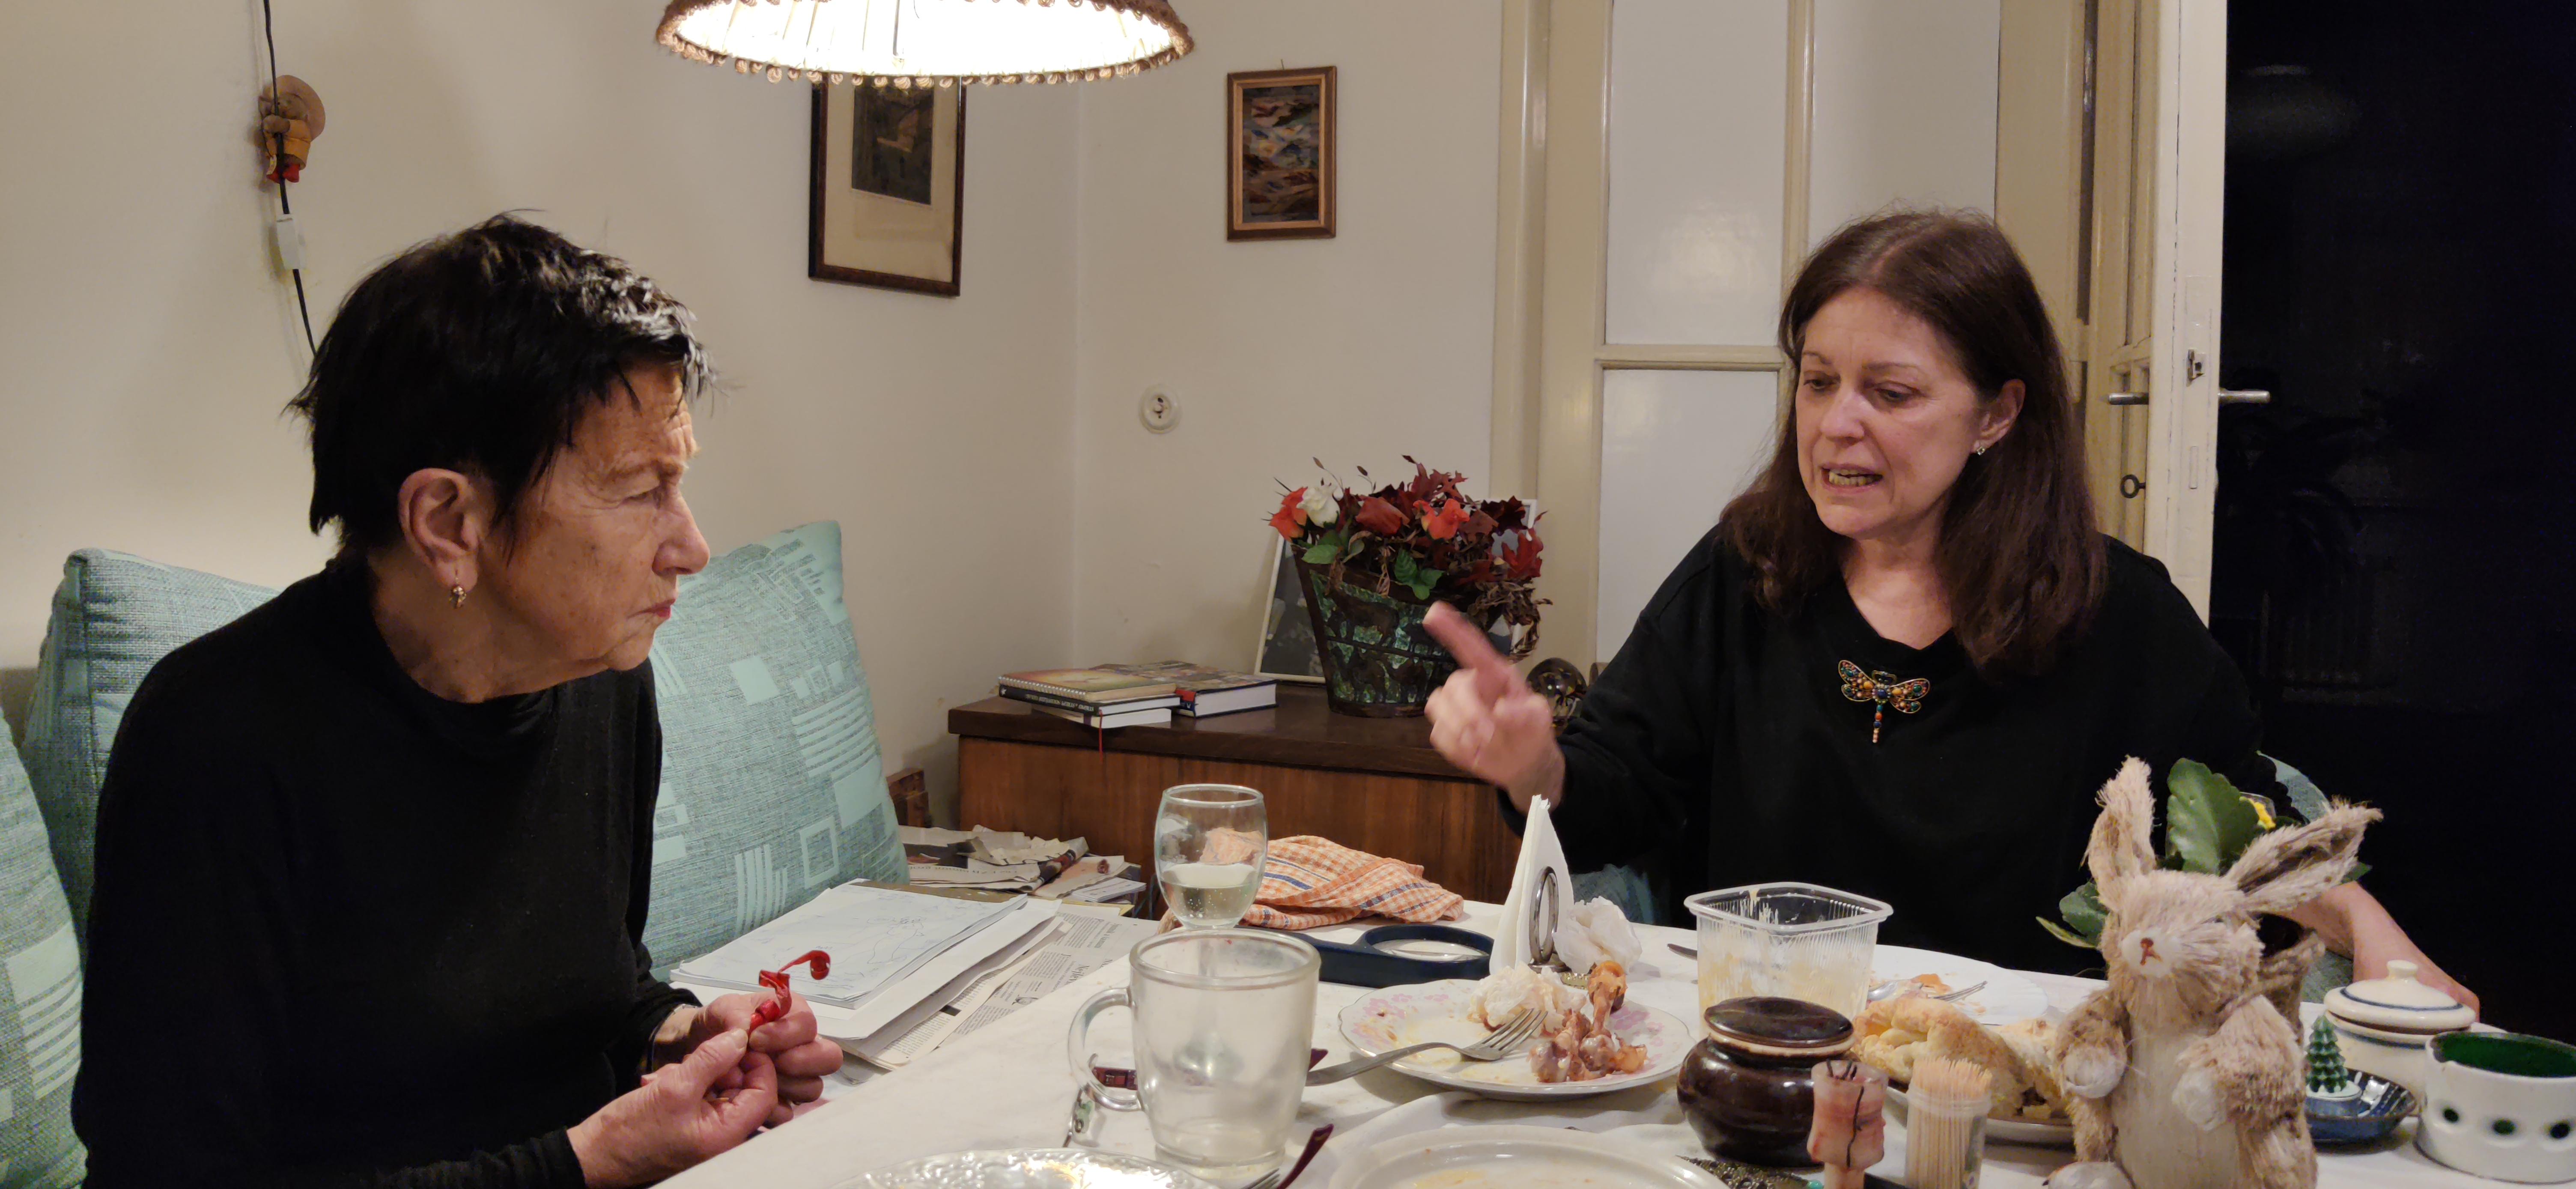 Klimentska-2021-velikonoce-3